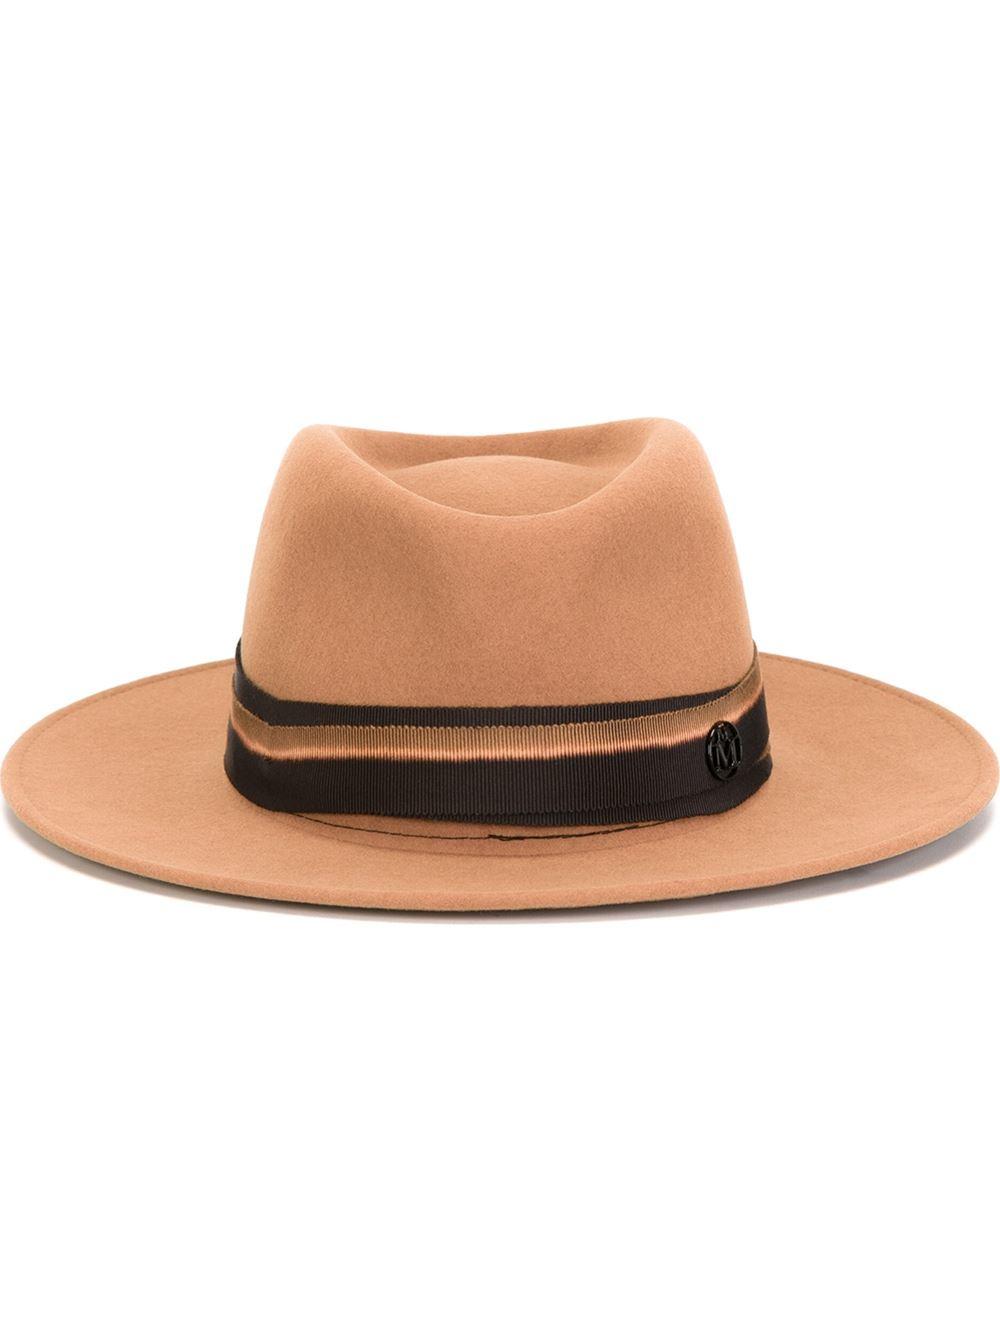 Maison michel fedora hat in brown lyst for Maison michel